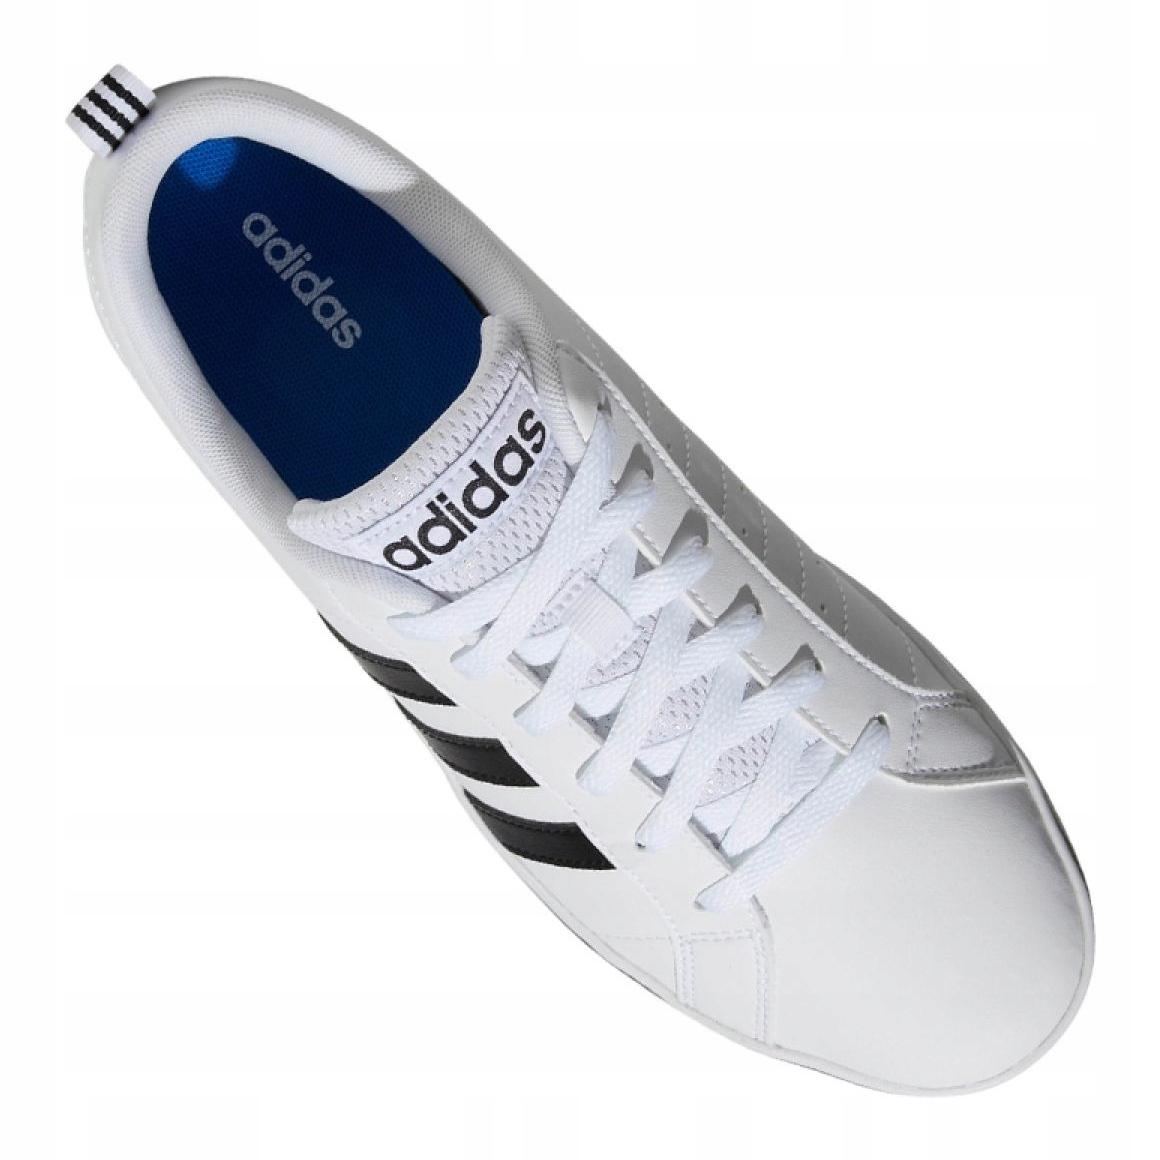 Adidas Zu Aw4594 Details Schuhe Vs M Weiß Pace 8OXn0ZPwNk